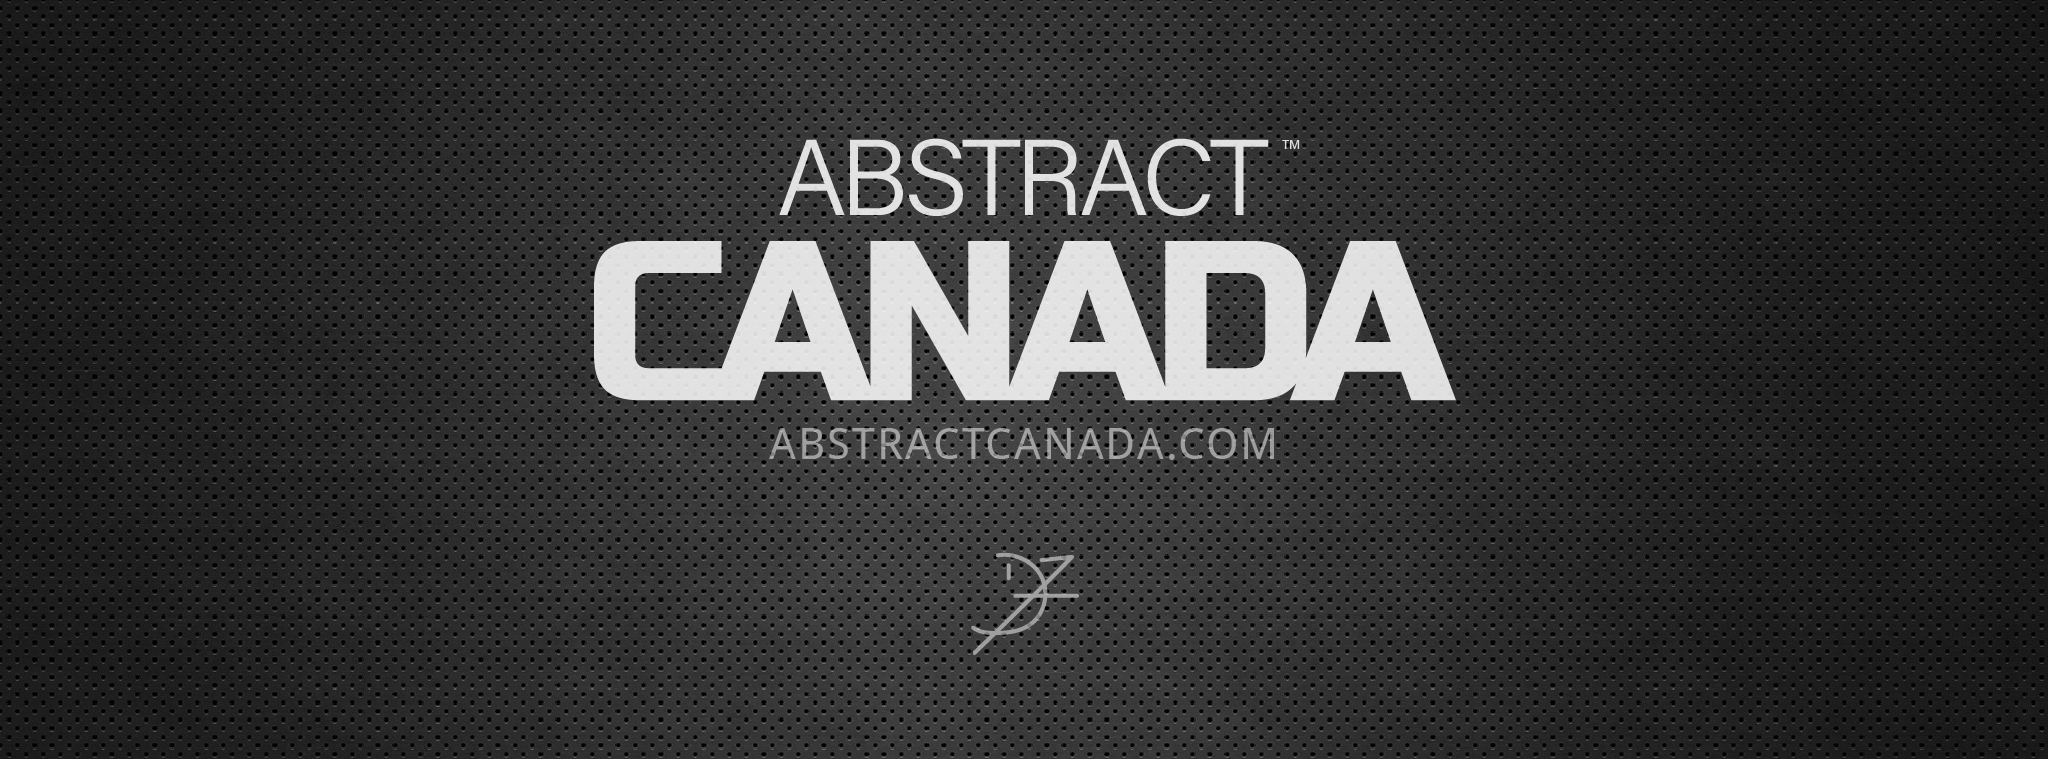 Abstract Canada (@abstractcanada) Cover Image